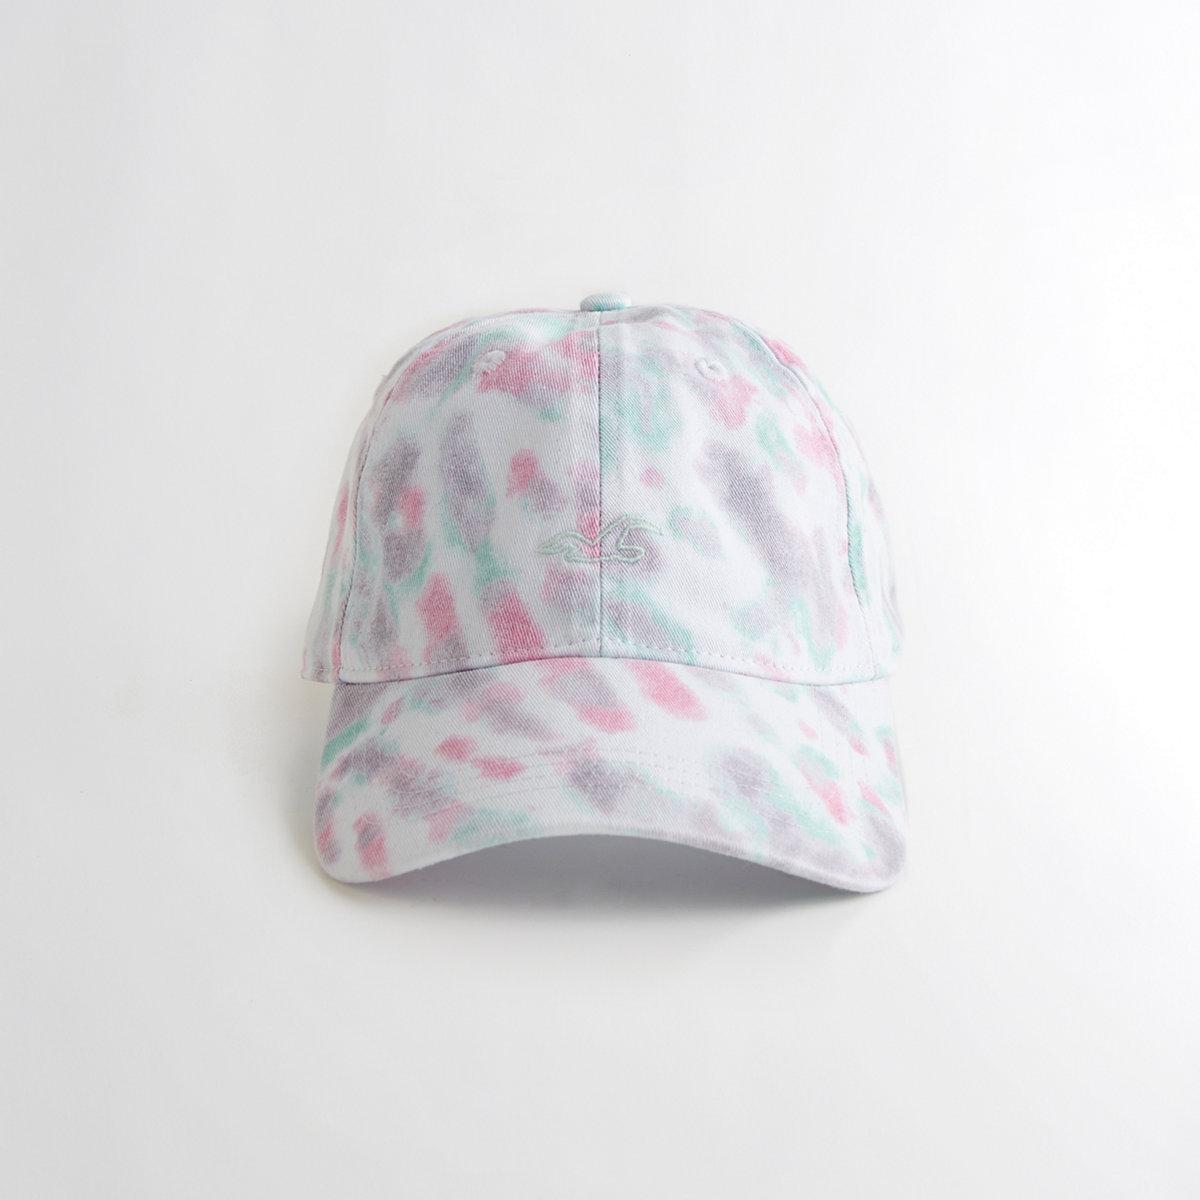 Girls Tie-Dye Dad Hat from Hollister